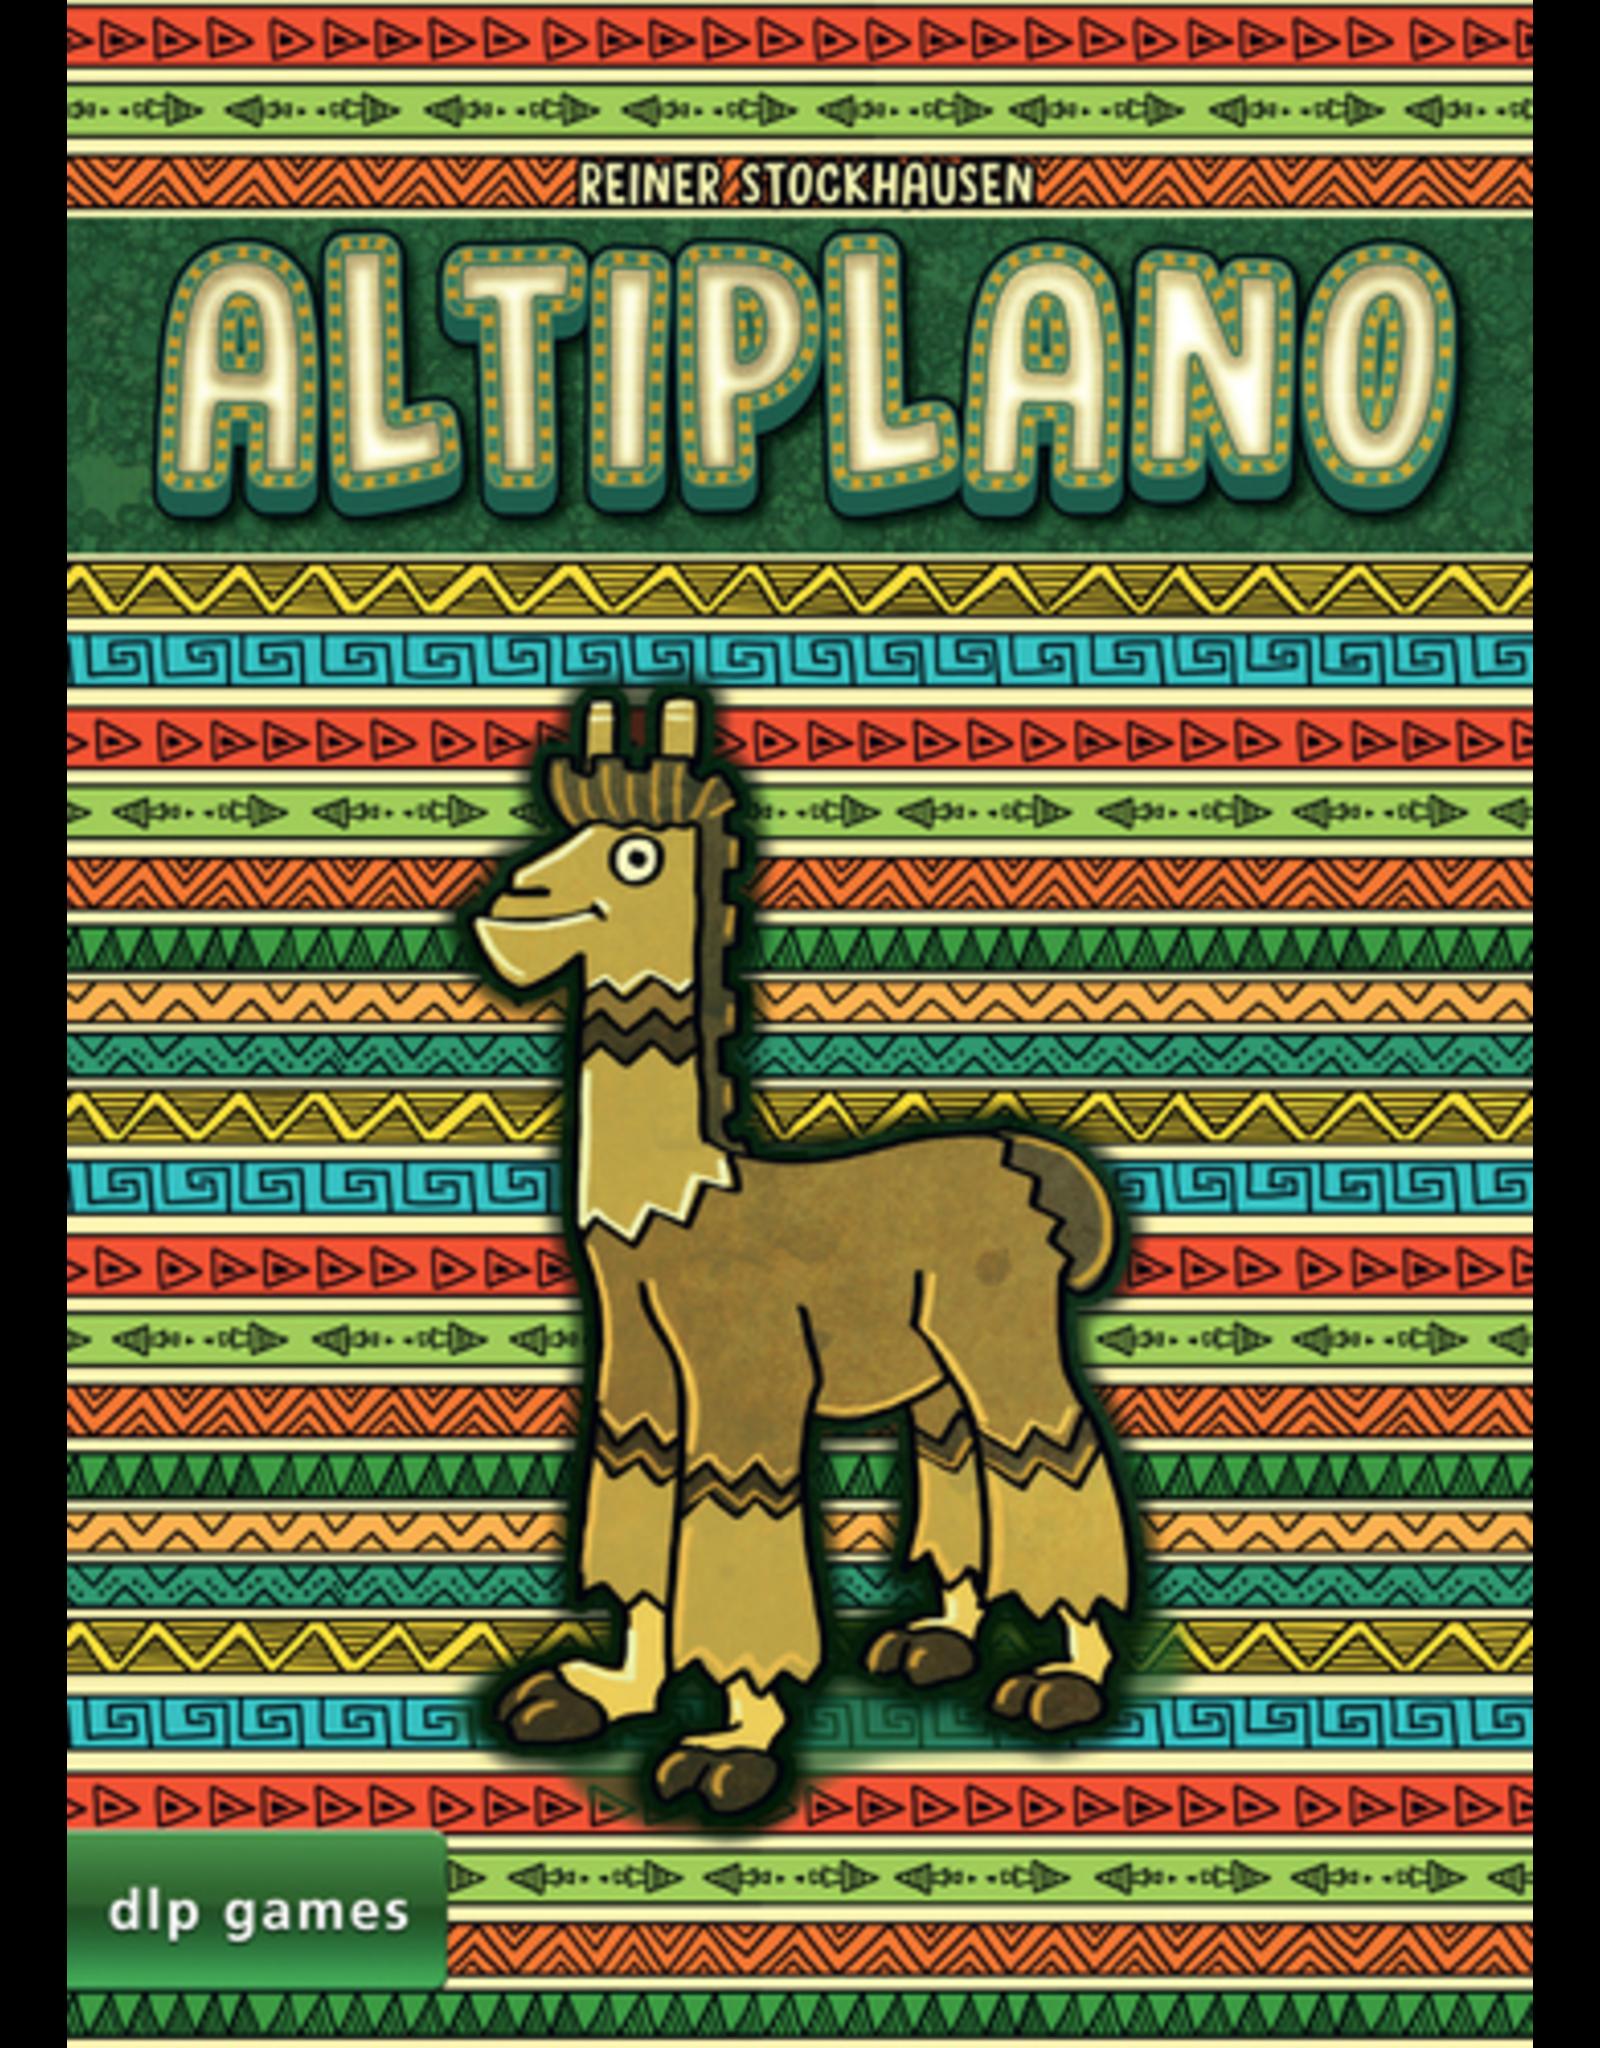 Renegade Altiplano